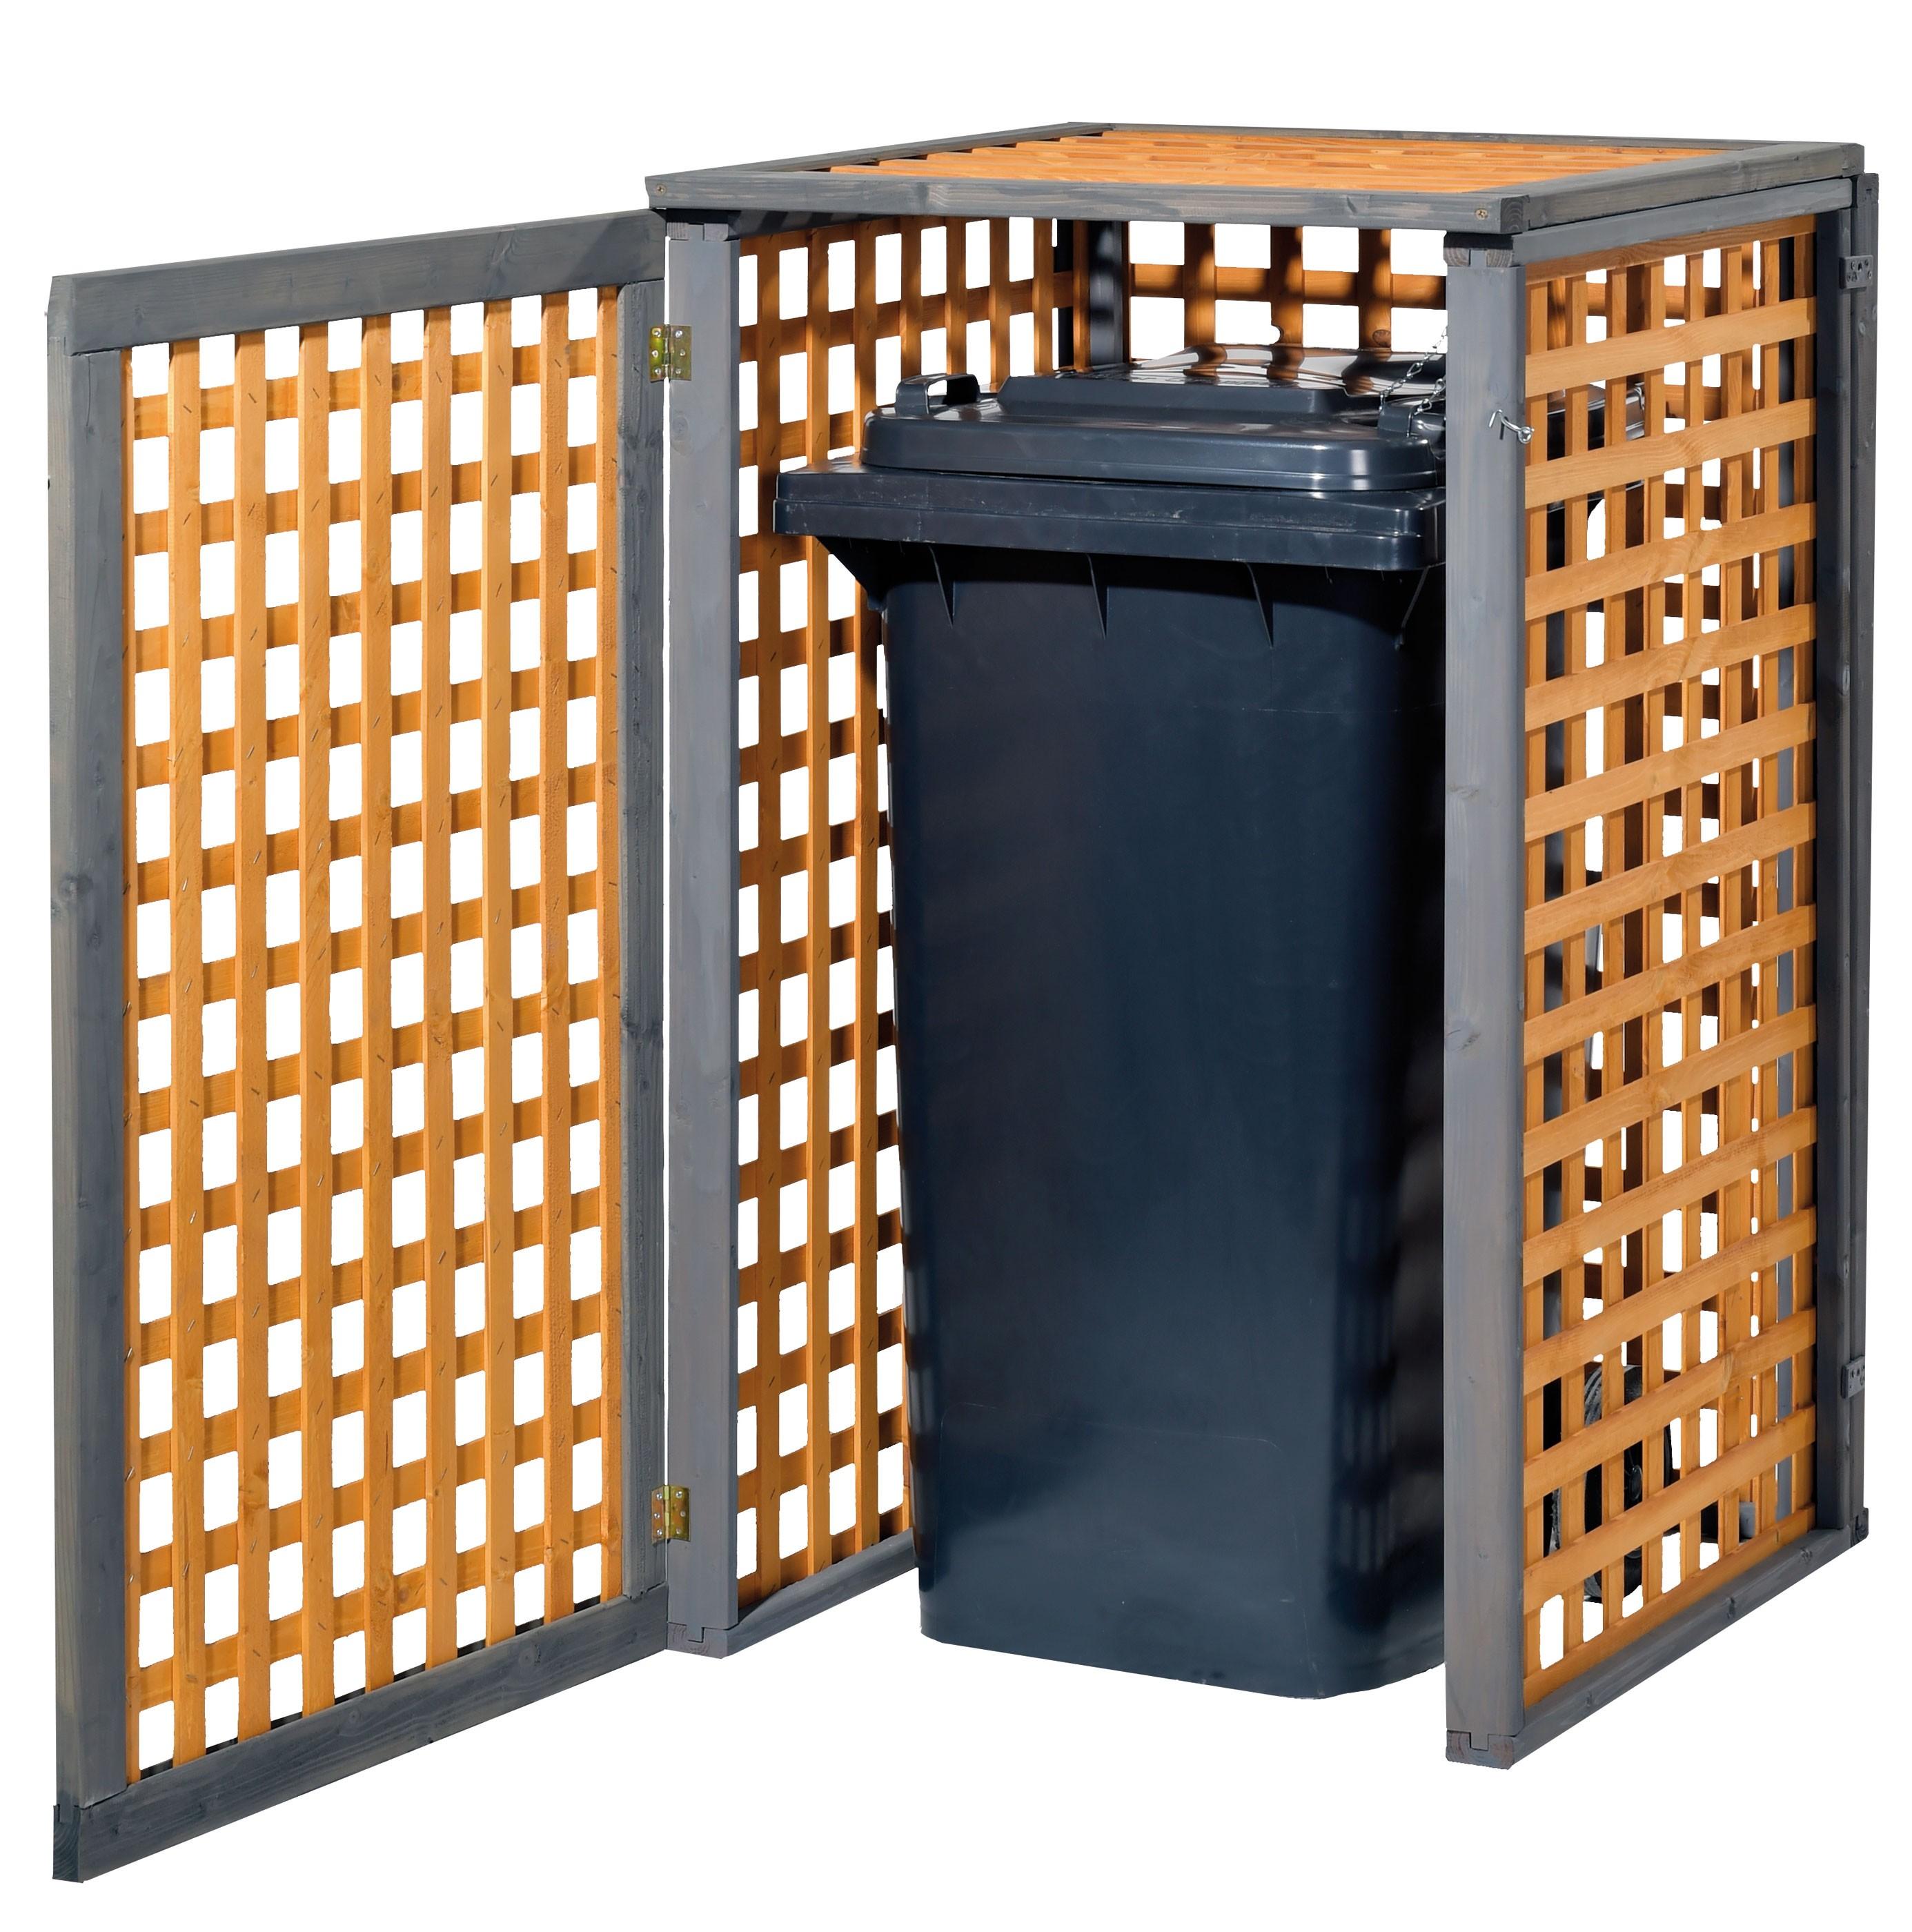 Holz Mülltonnenbox Kaprun für 1x 240Liter Mülltonne Bild 1